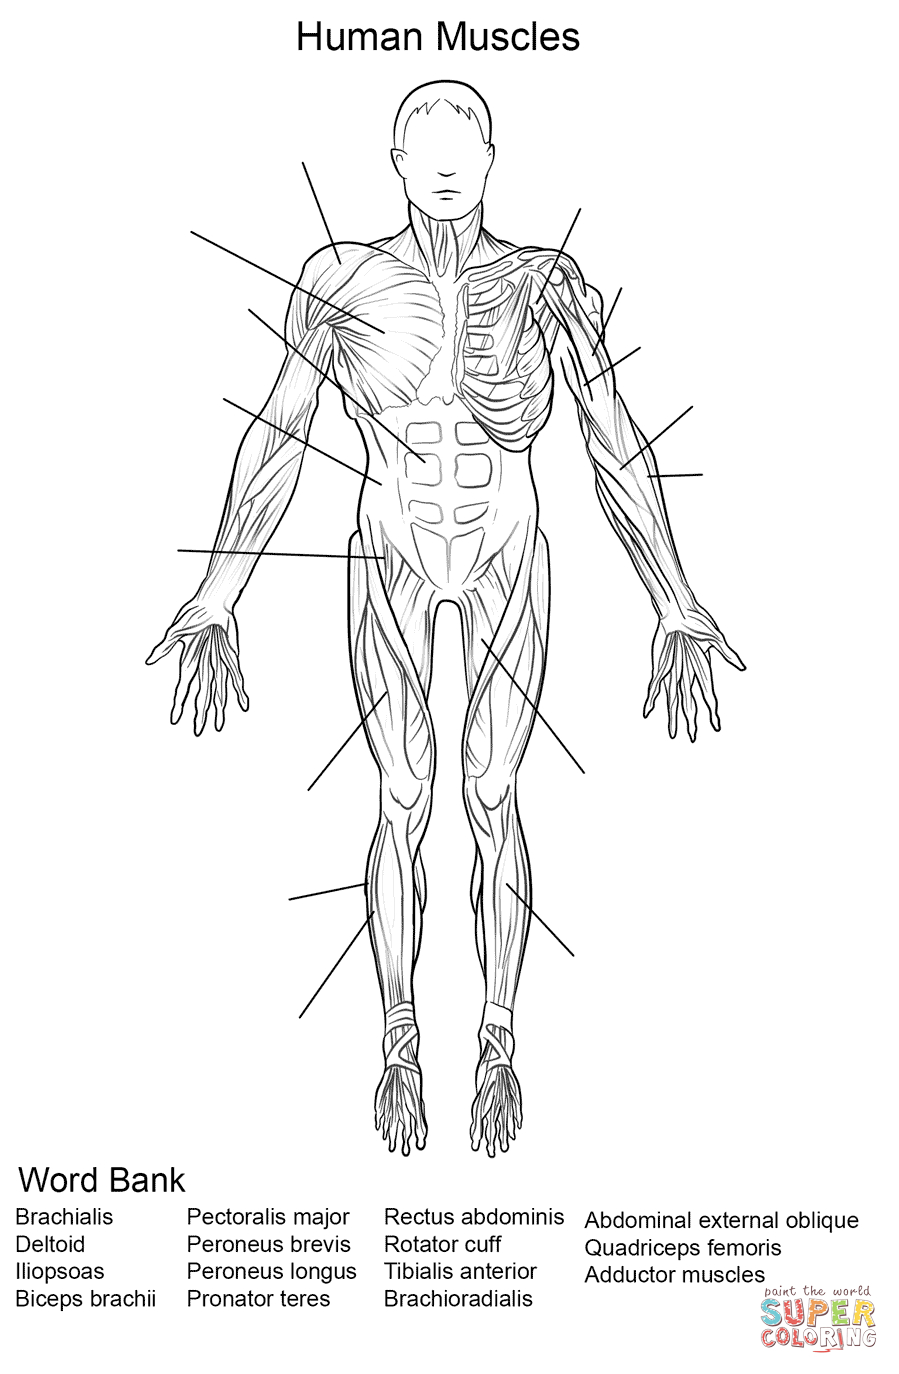 Human Muscles Front View Worksheet Coloring Page | Free Printable - Free Printable Human Anatomy Worksheets